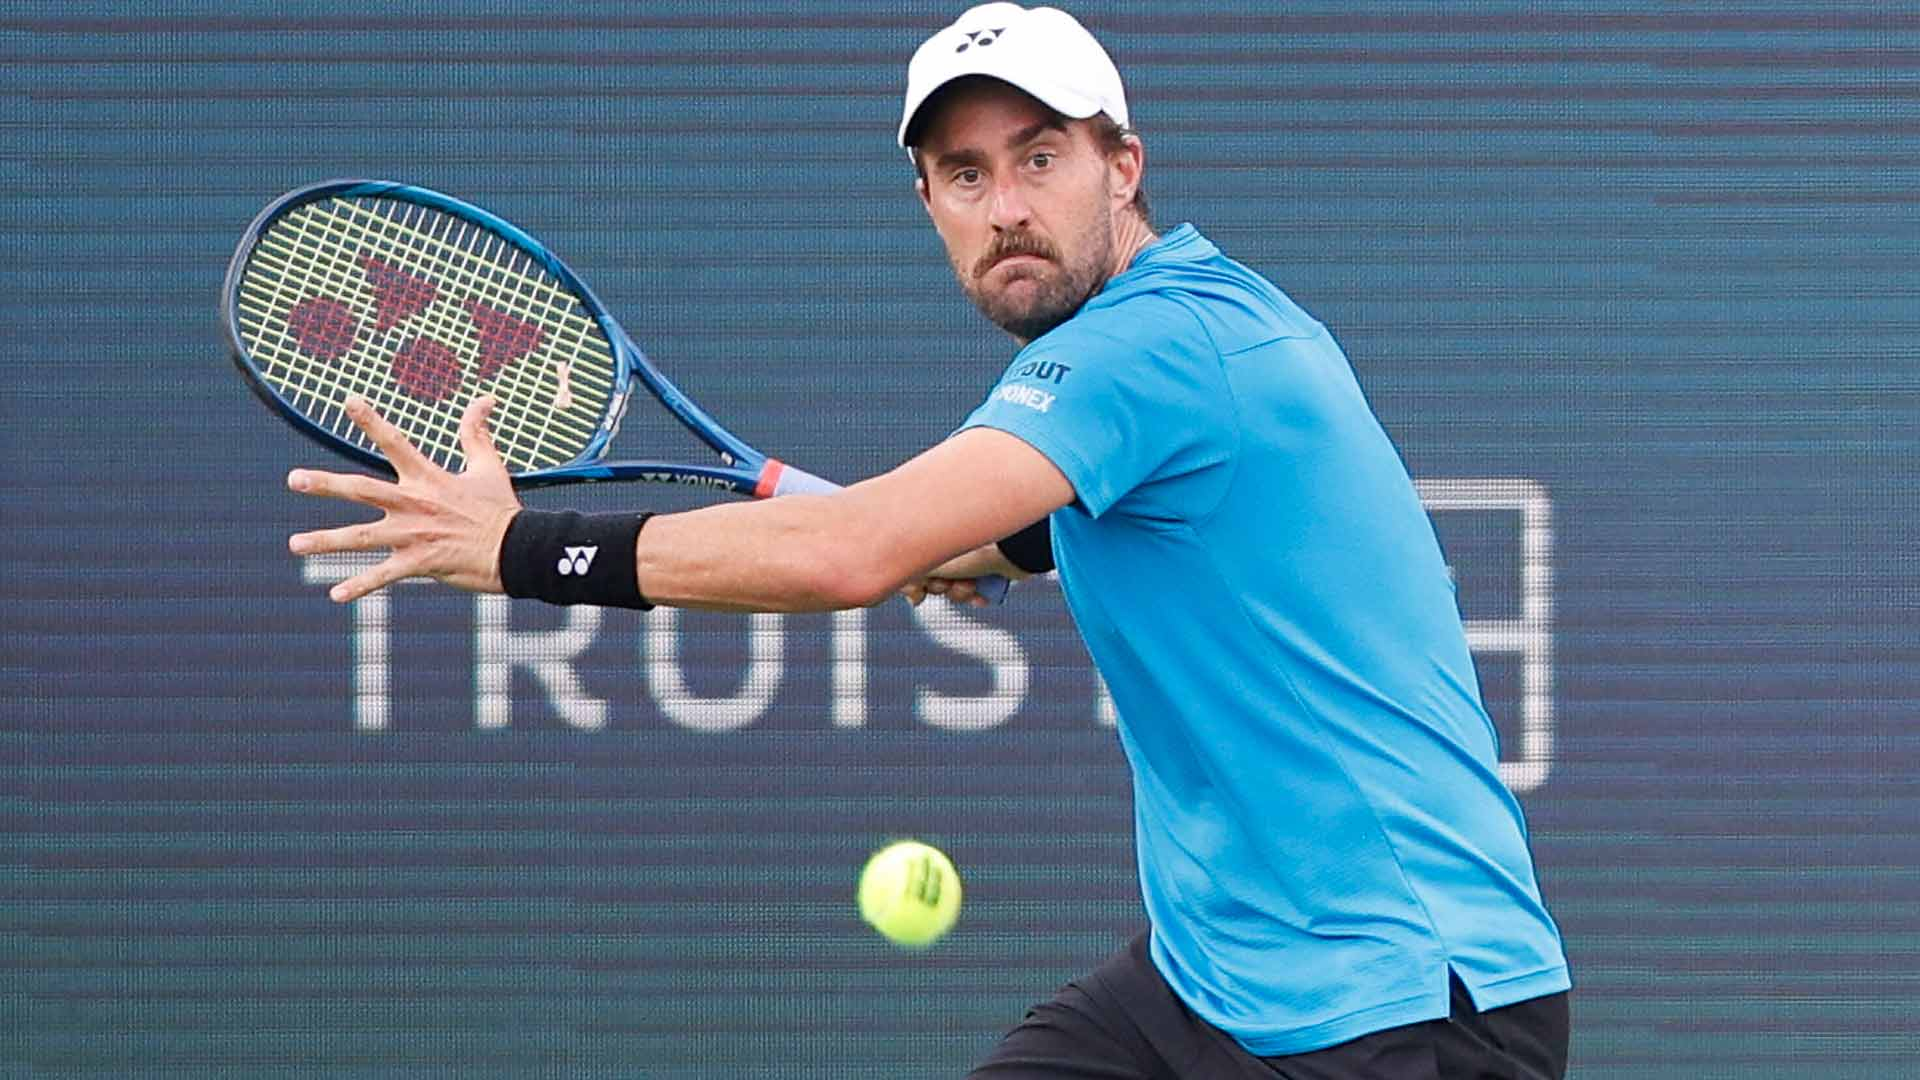 Washington Open 2021: Steve Johnson vs. Ricardas Berankis Tennis Pick and Prediction